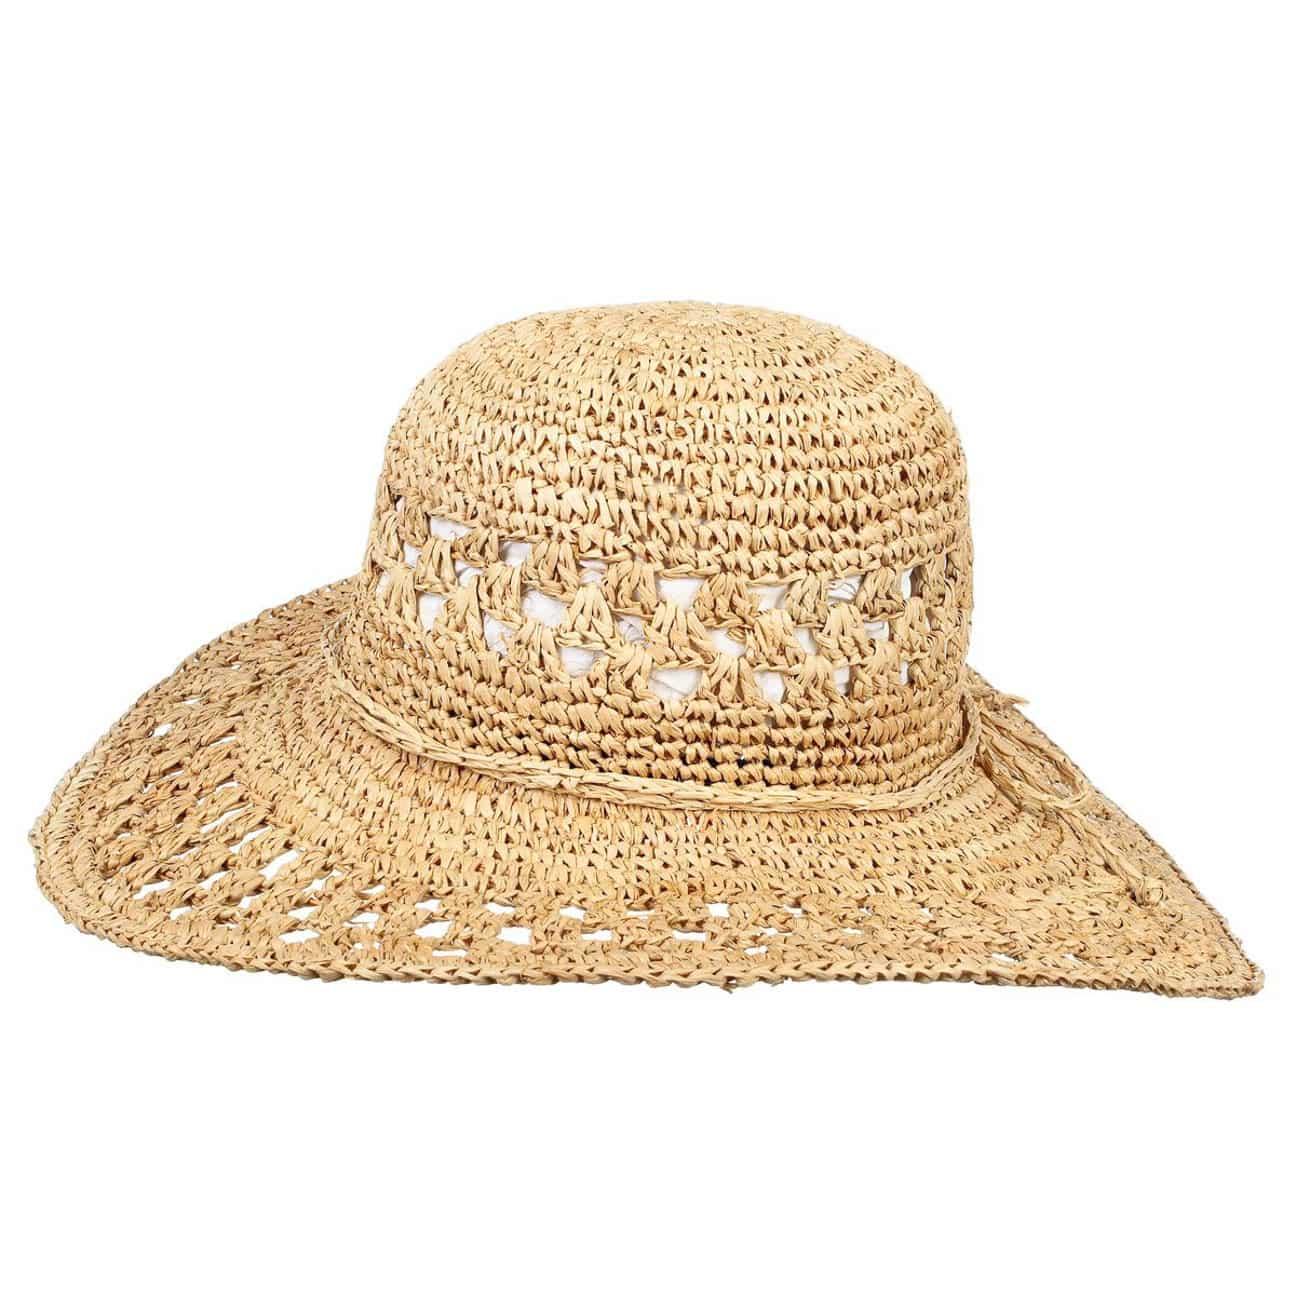 Sombrero de Crochet de Rafia Beach - Sombreros - sombreroshop.es c9f0e921f2bb